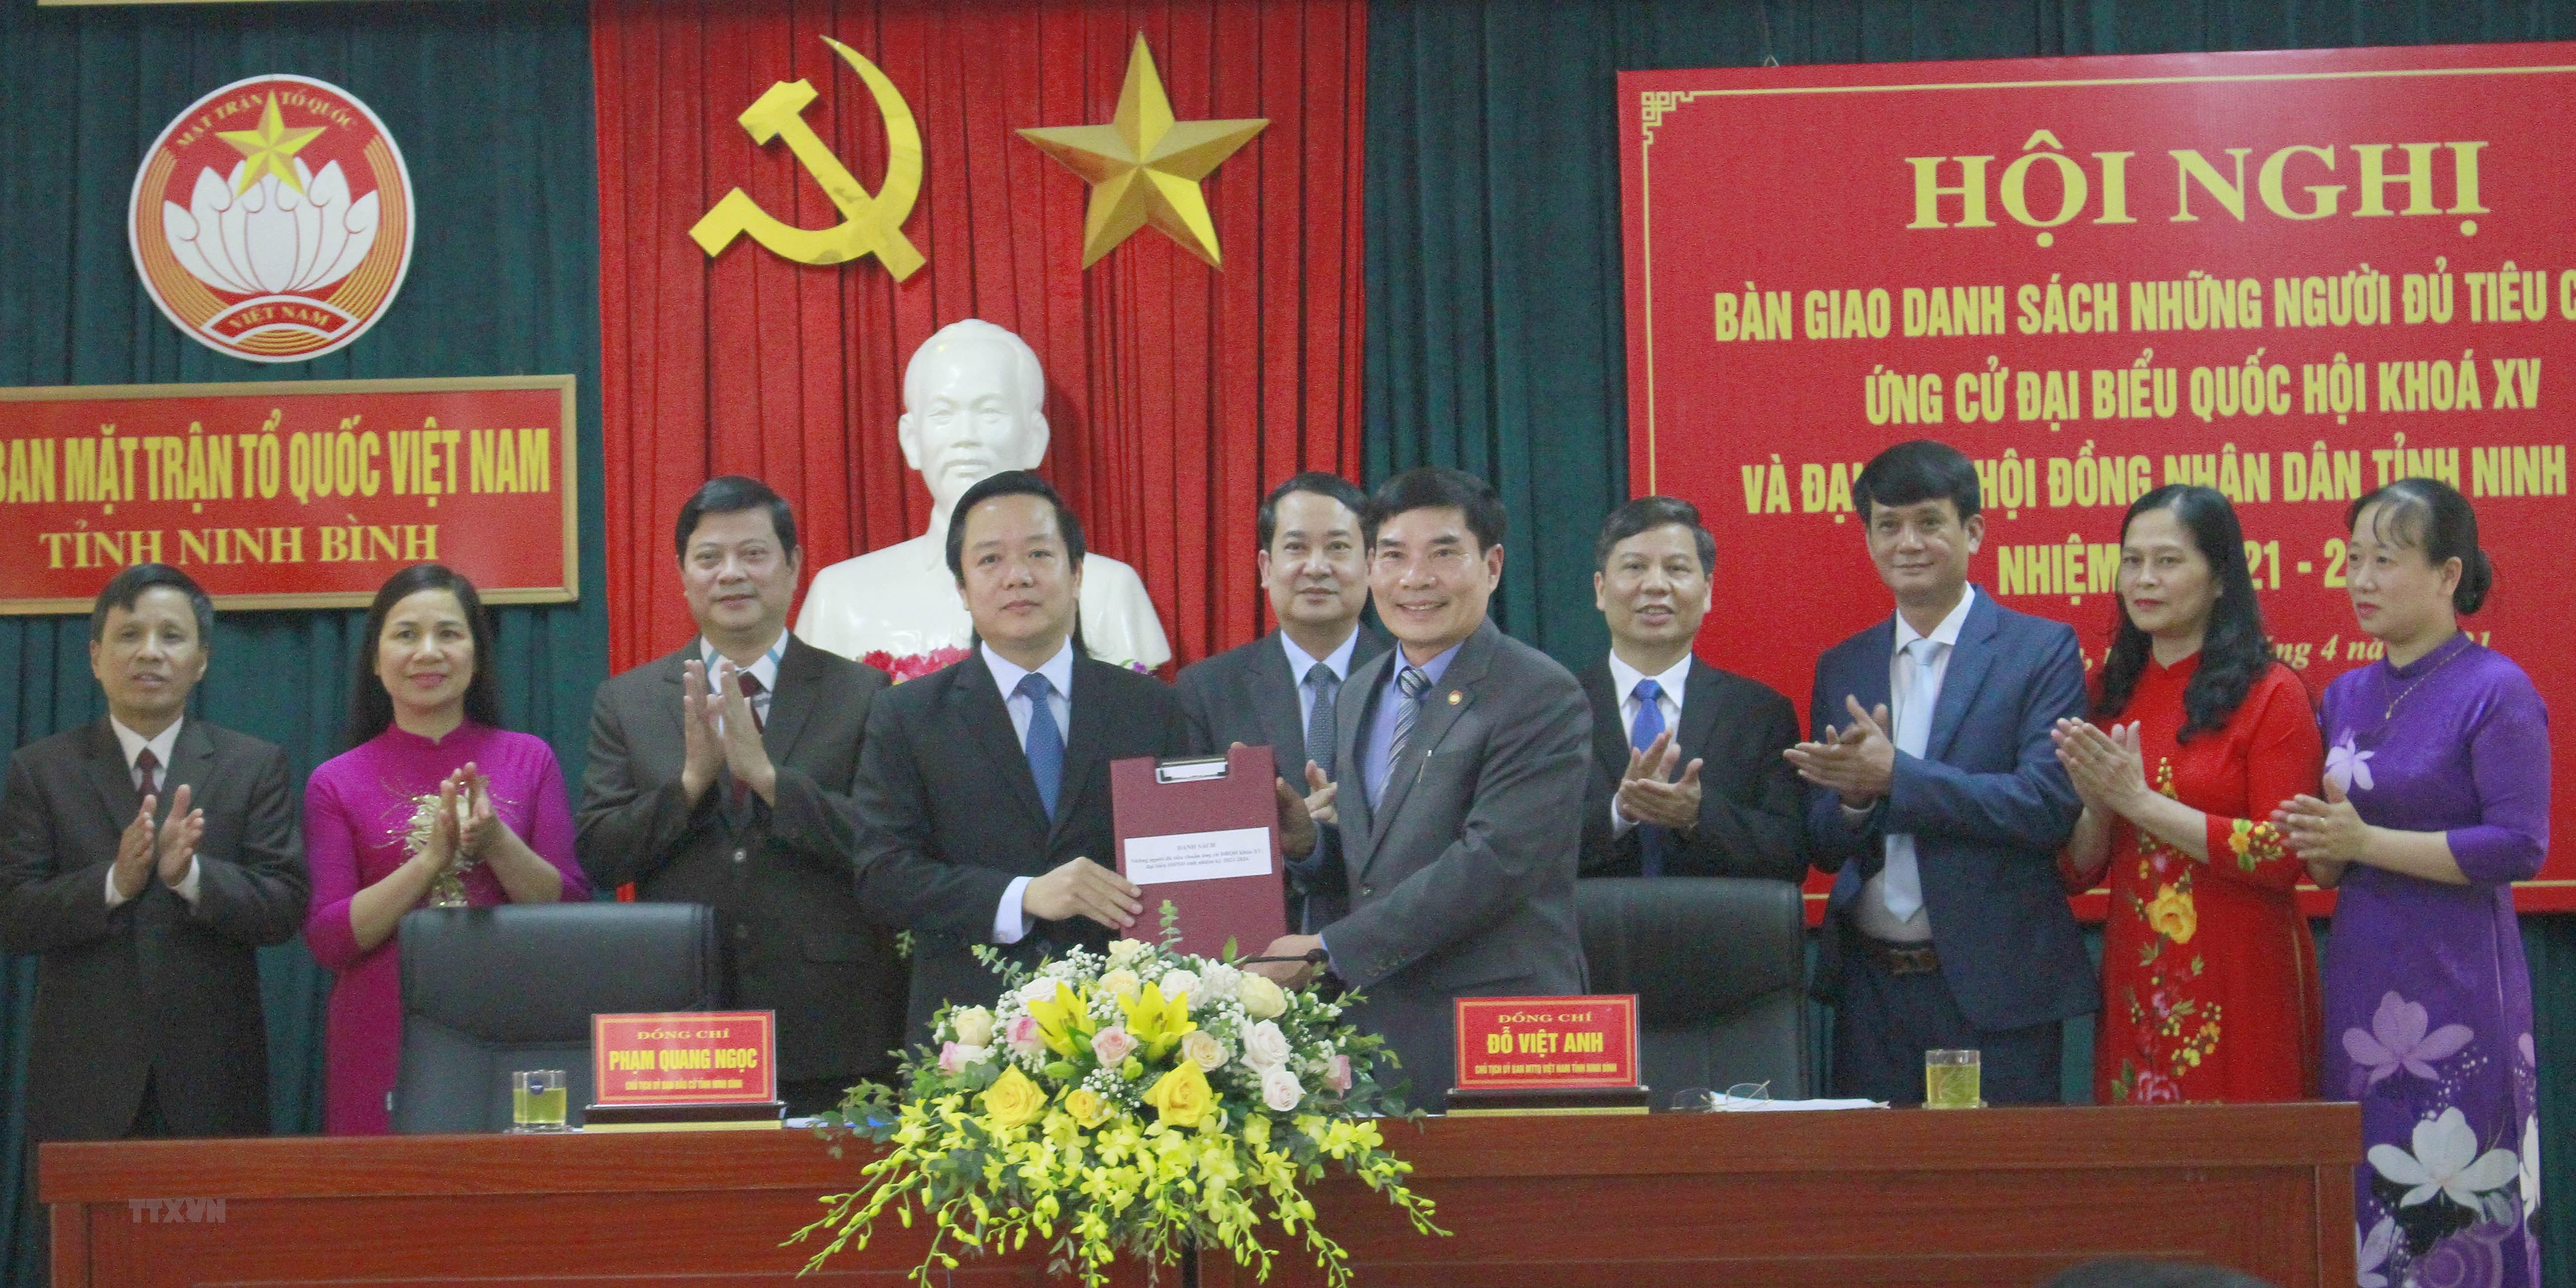 Ninh Binh to chuc cac hoi nghi van dong bau cu phu hop chong dich hinh anh 1